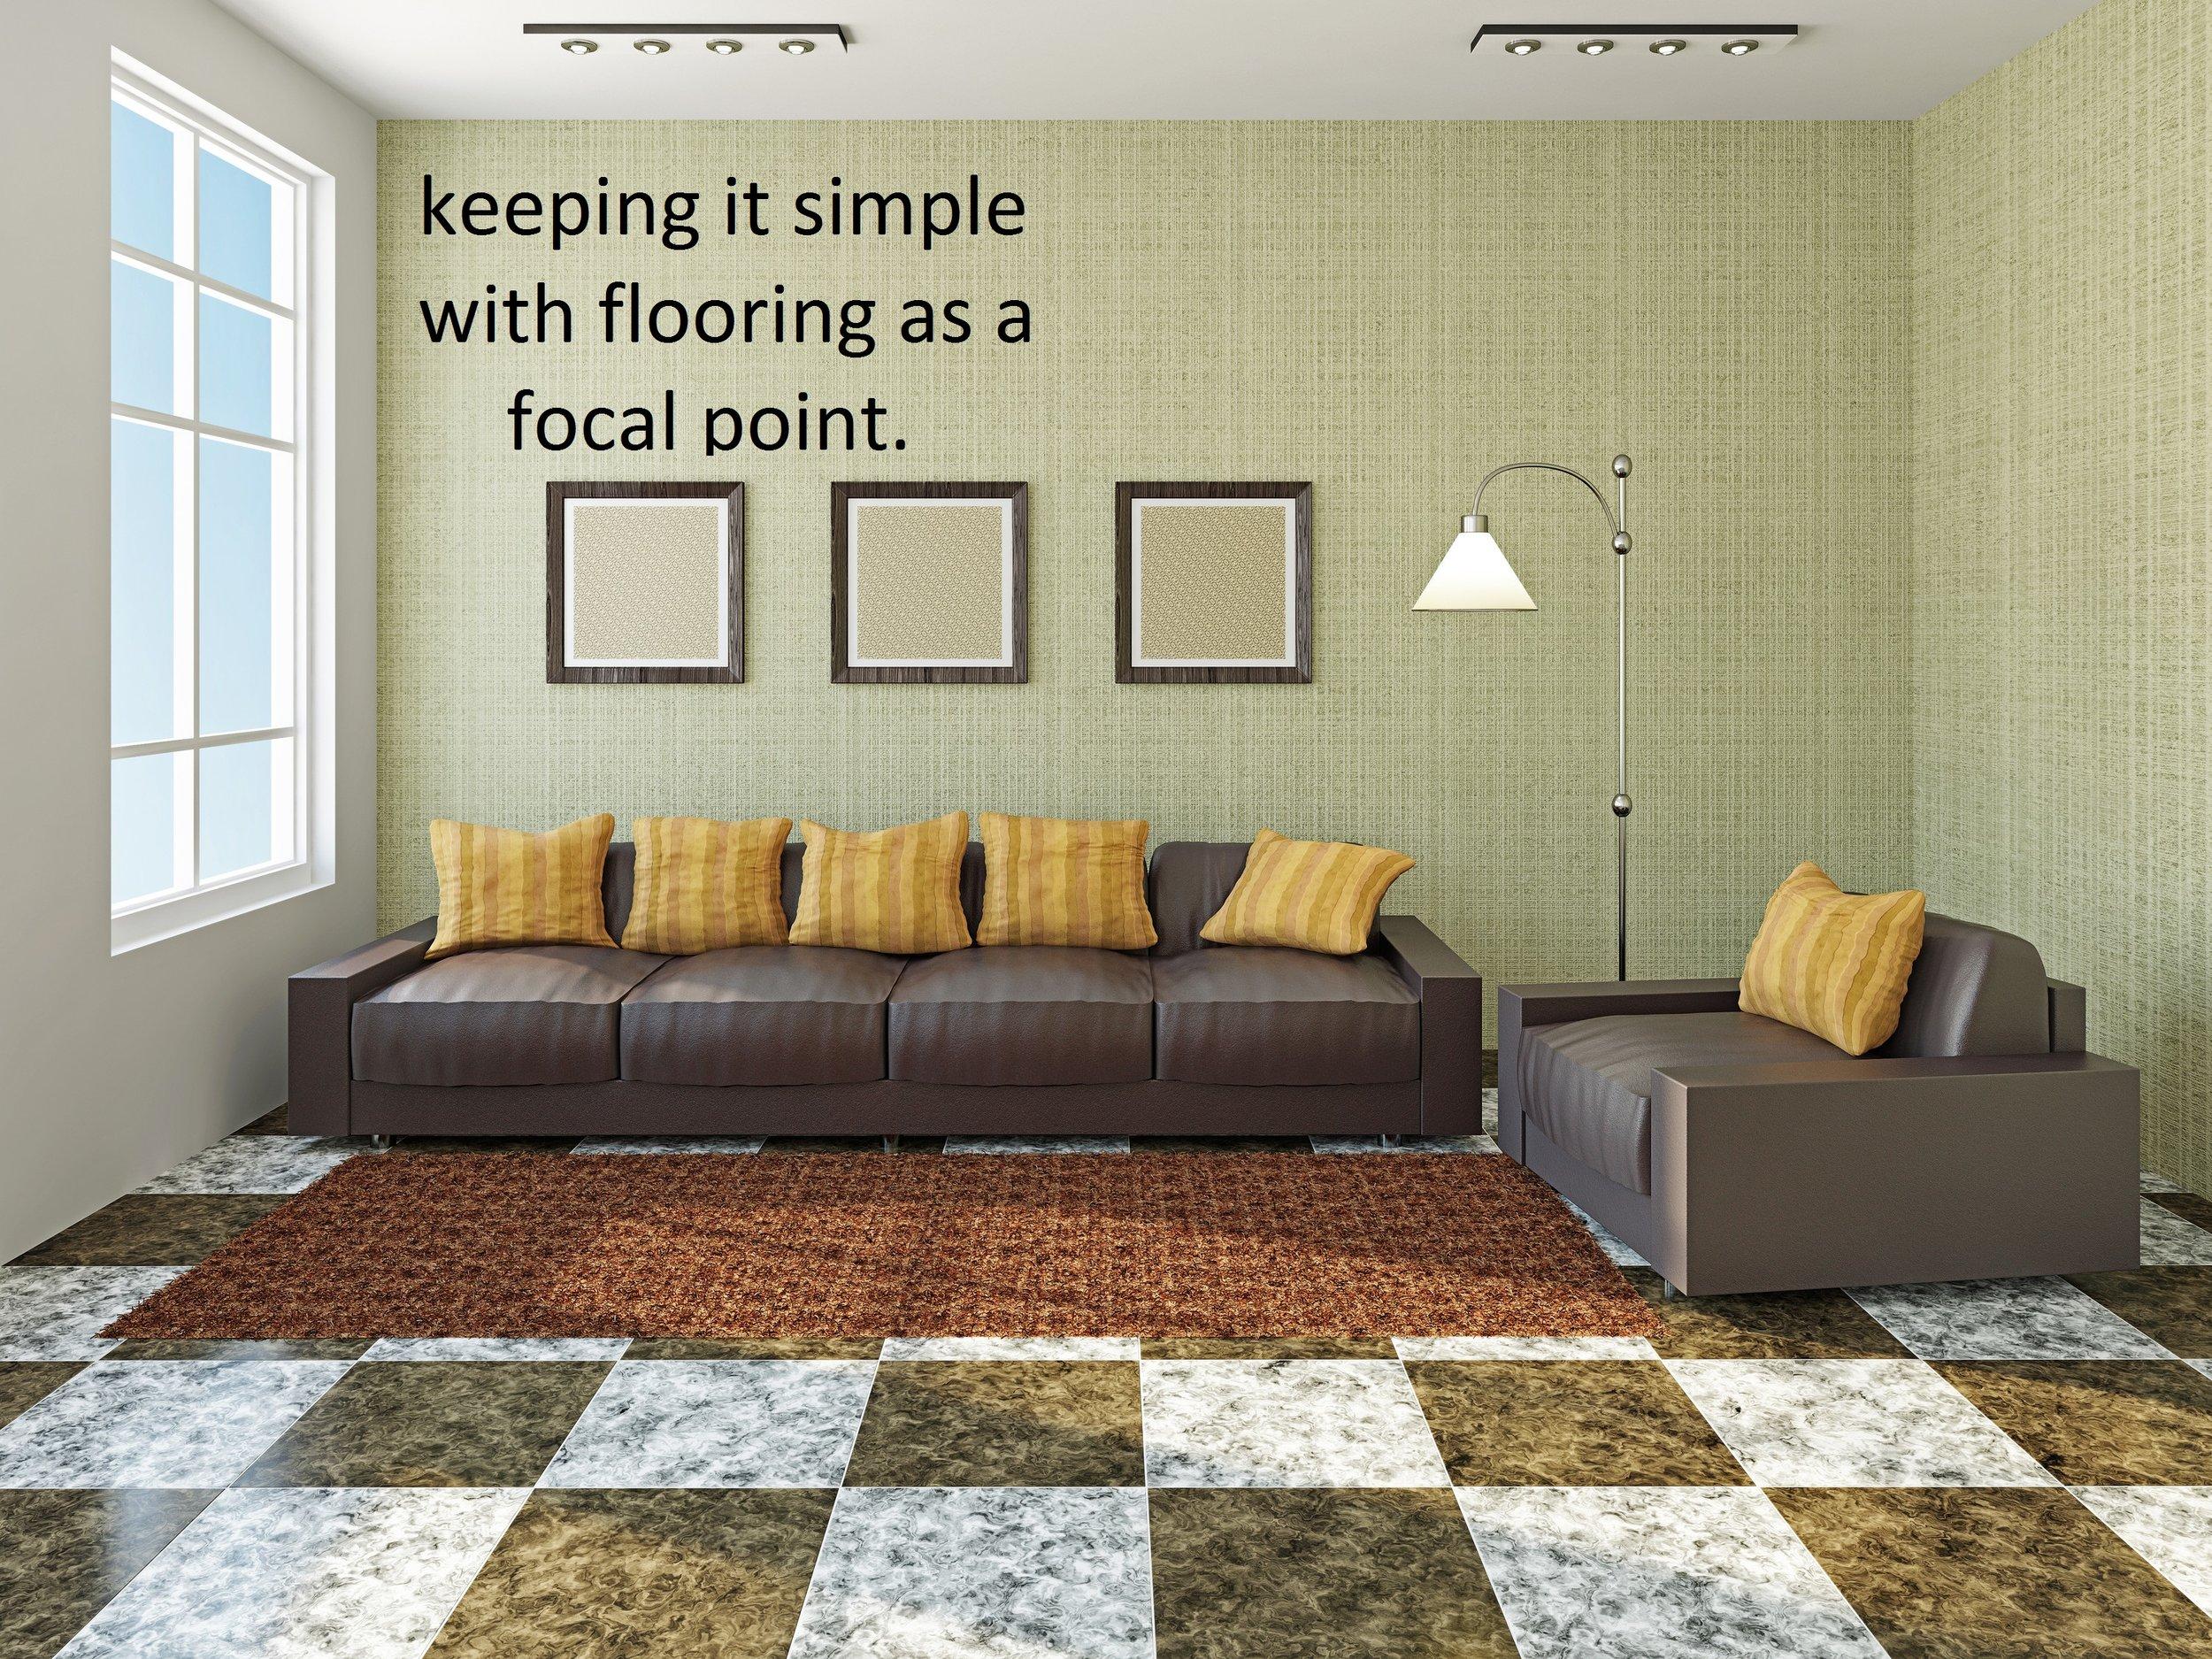 flooring as a focal point.jpg